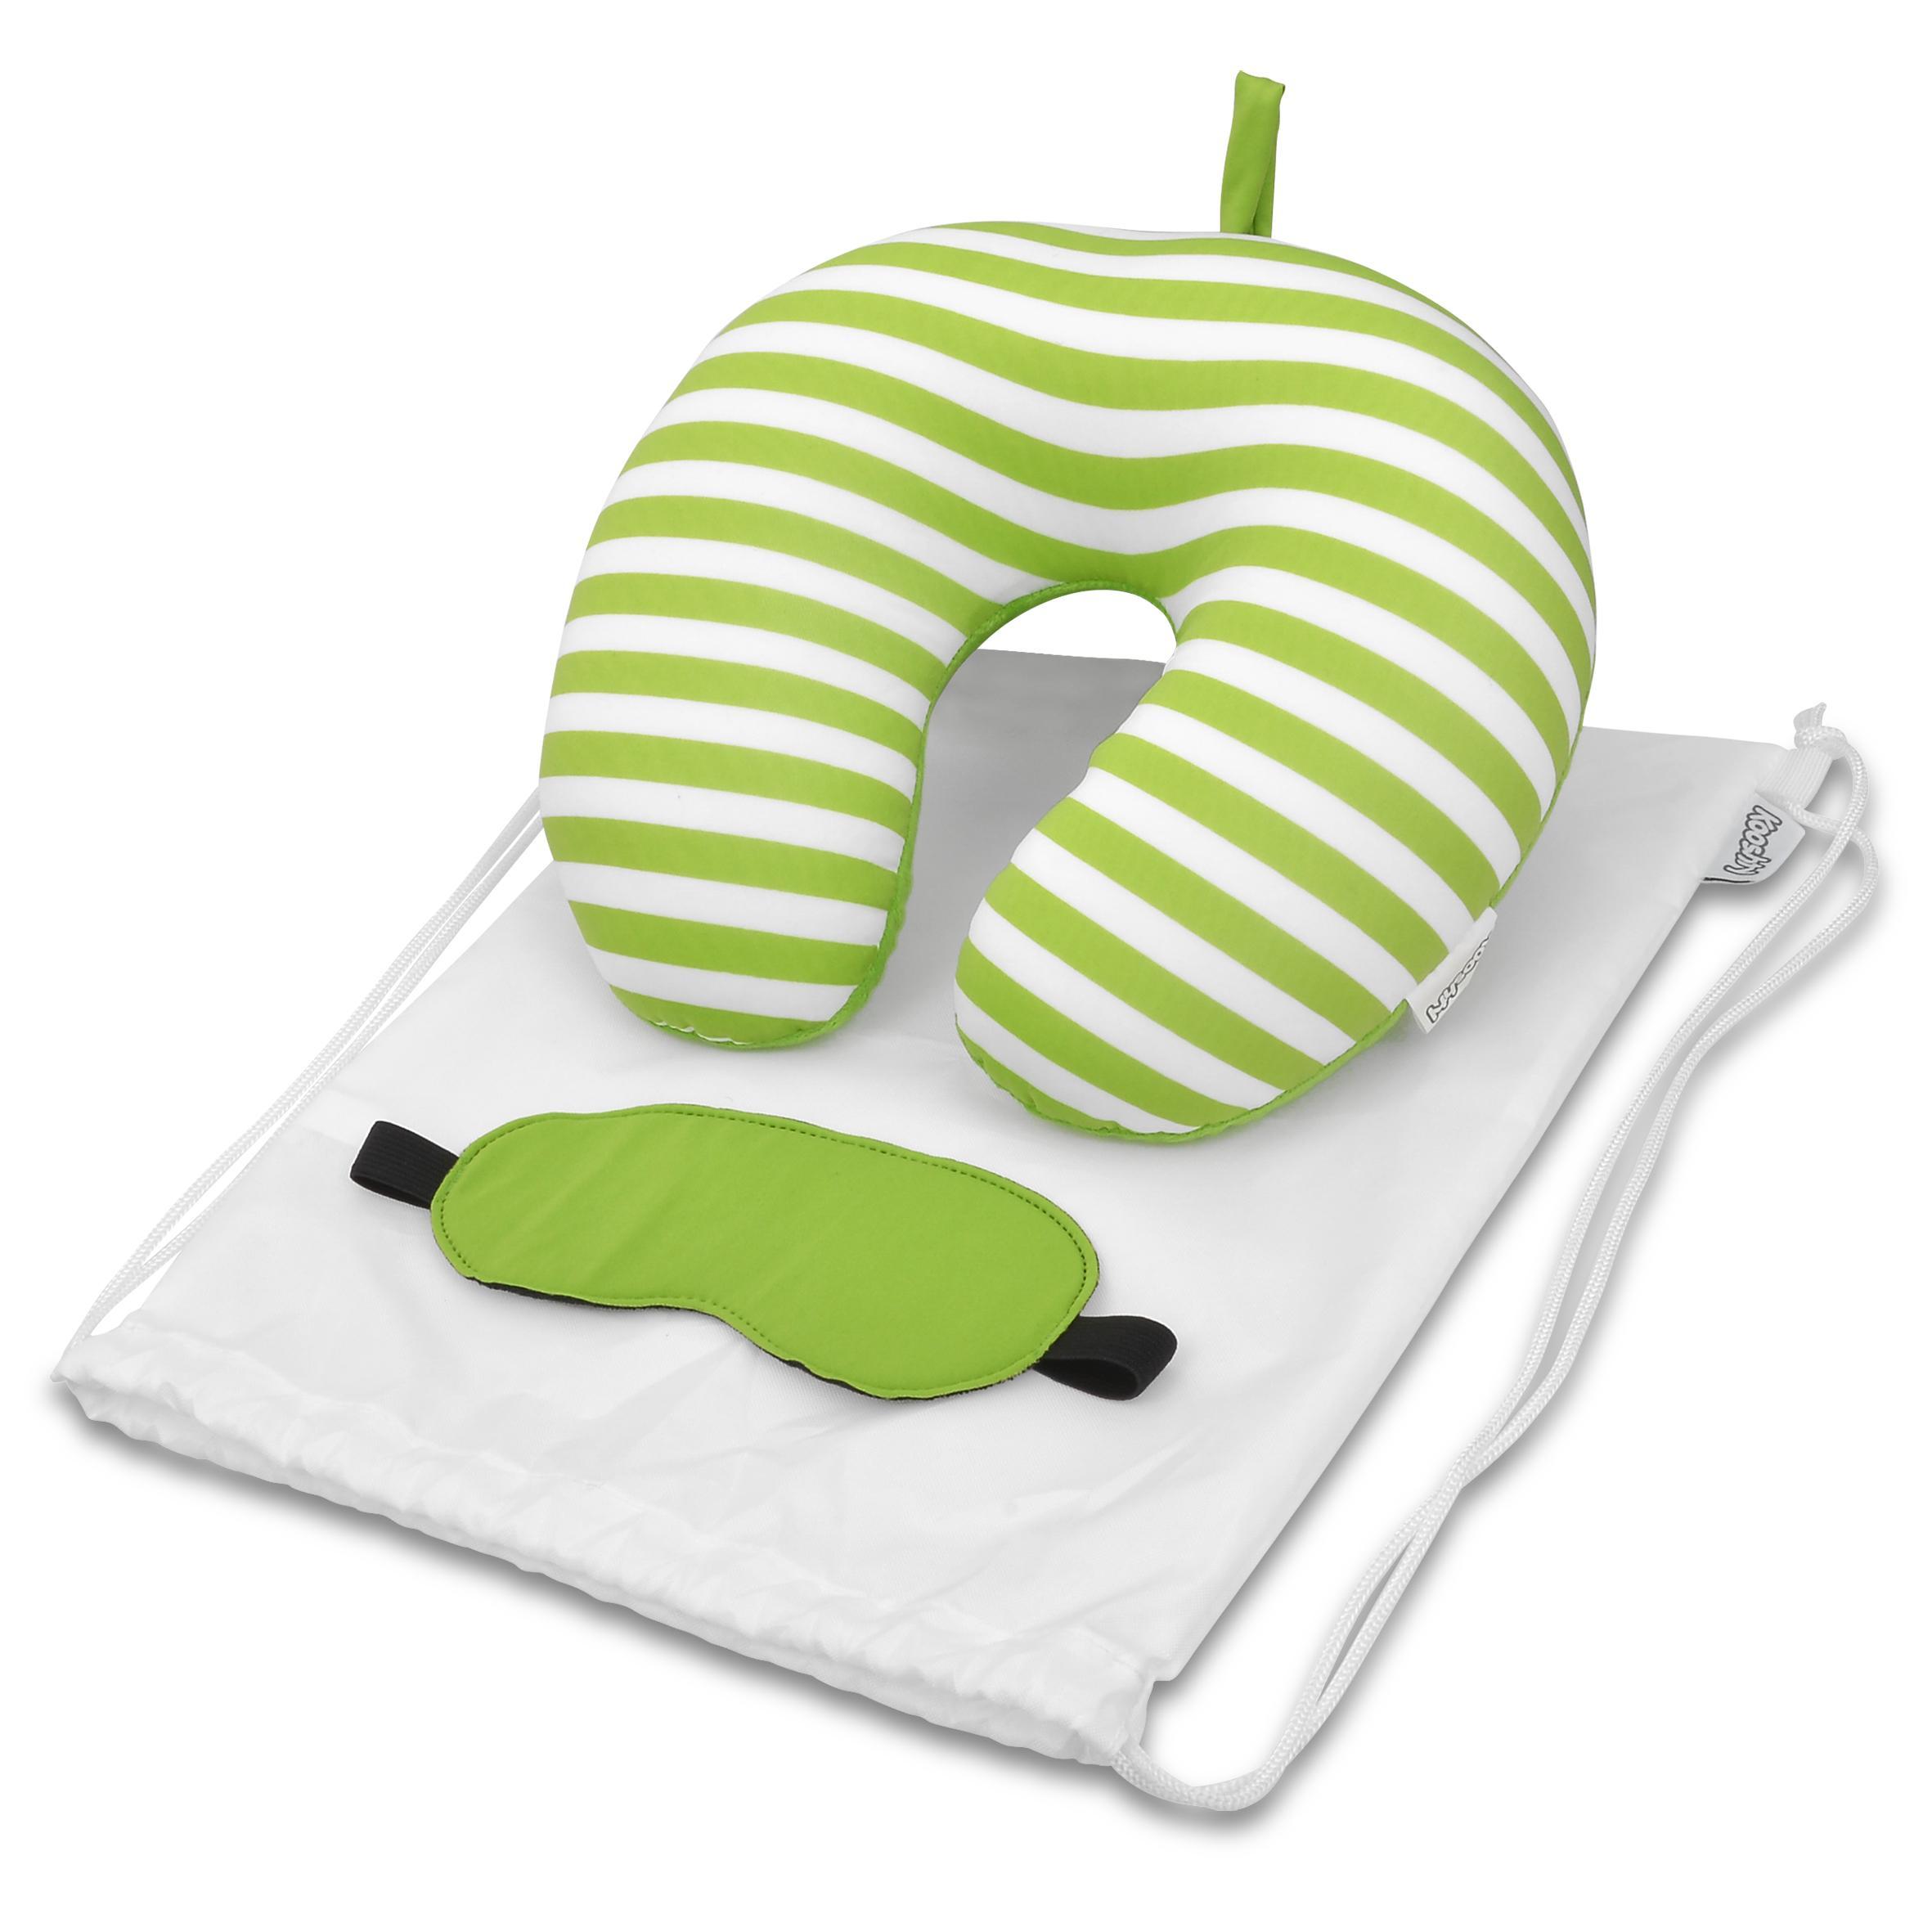 Kooshty Comfy Travel Set - Lime Only